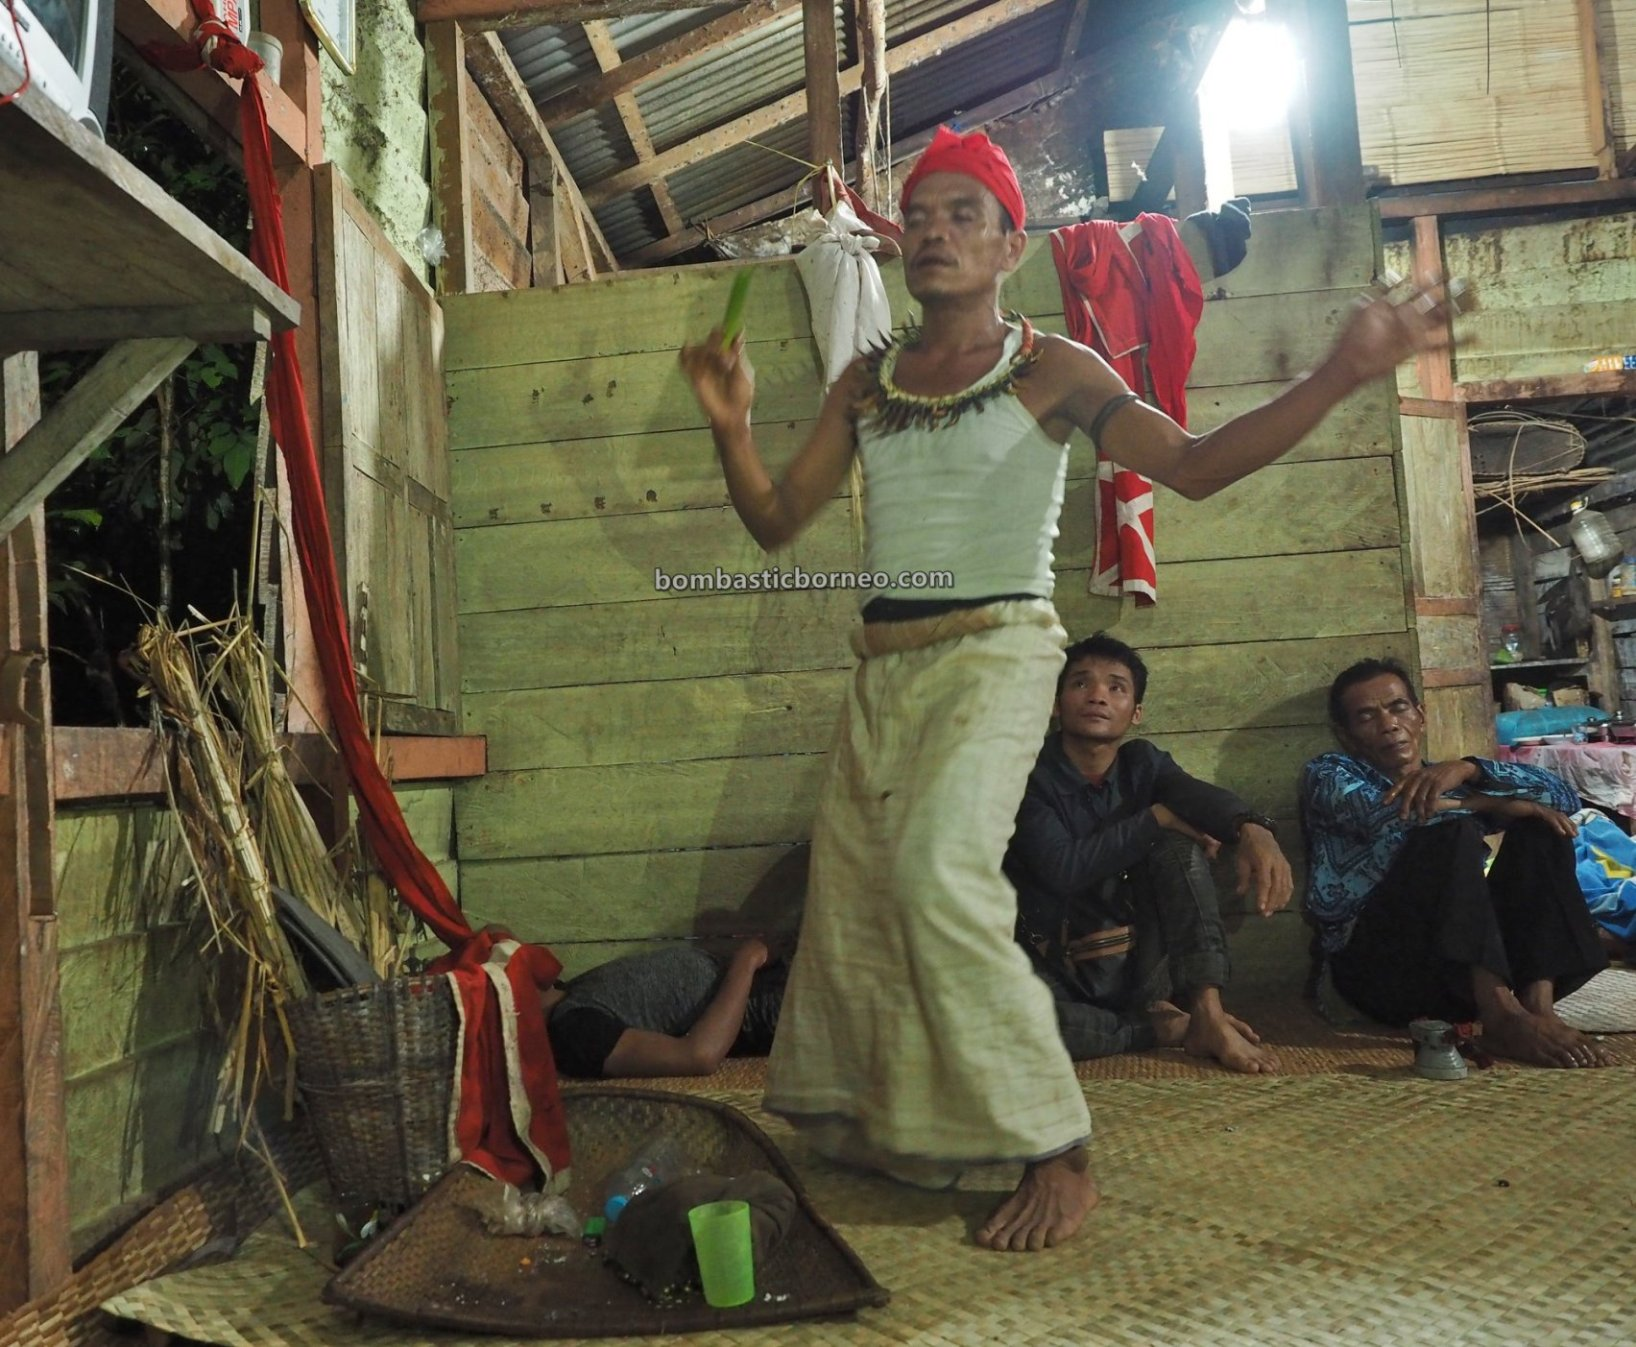 Nyobeng Kambih, Paddy Harvest Festival, authentic, ritual, Desa Bengkawan, indigenous, native, tribe, Dukun, Shaman, tourist attraction, Travel guide, Trans Borneo, 穿越婆罗洲游踪, 西加里曼丹达雅部落, 印尼孟加映文化